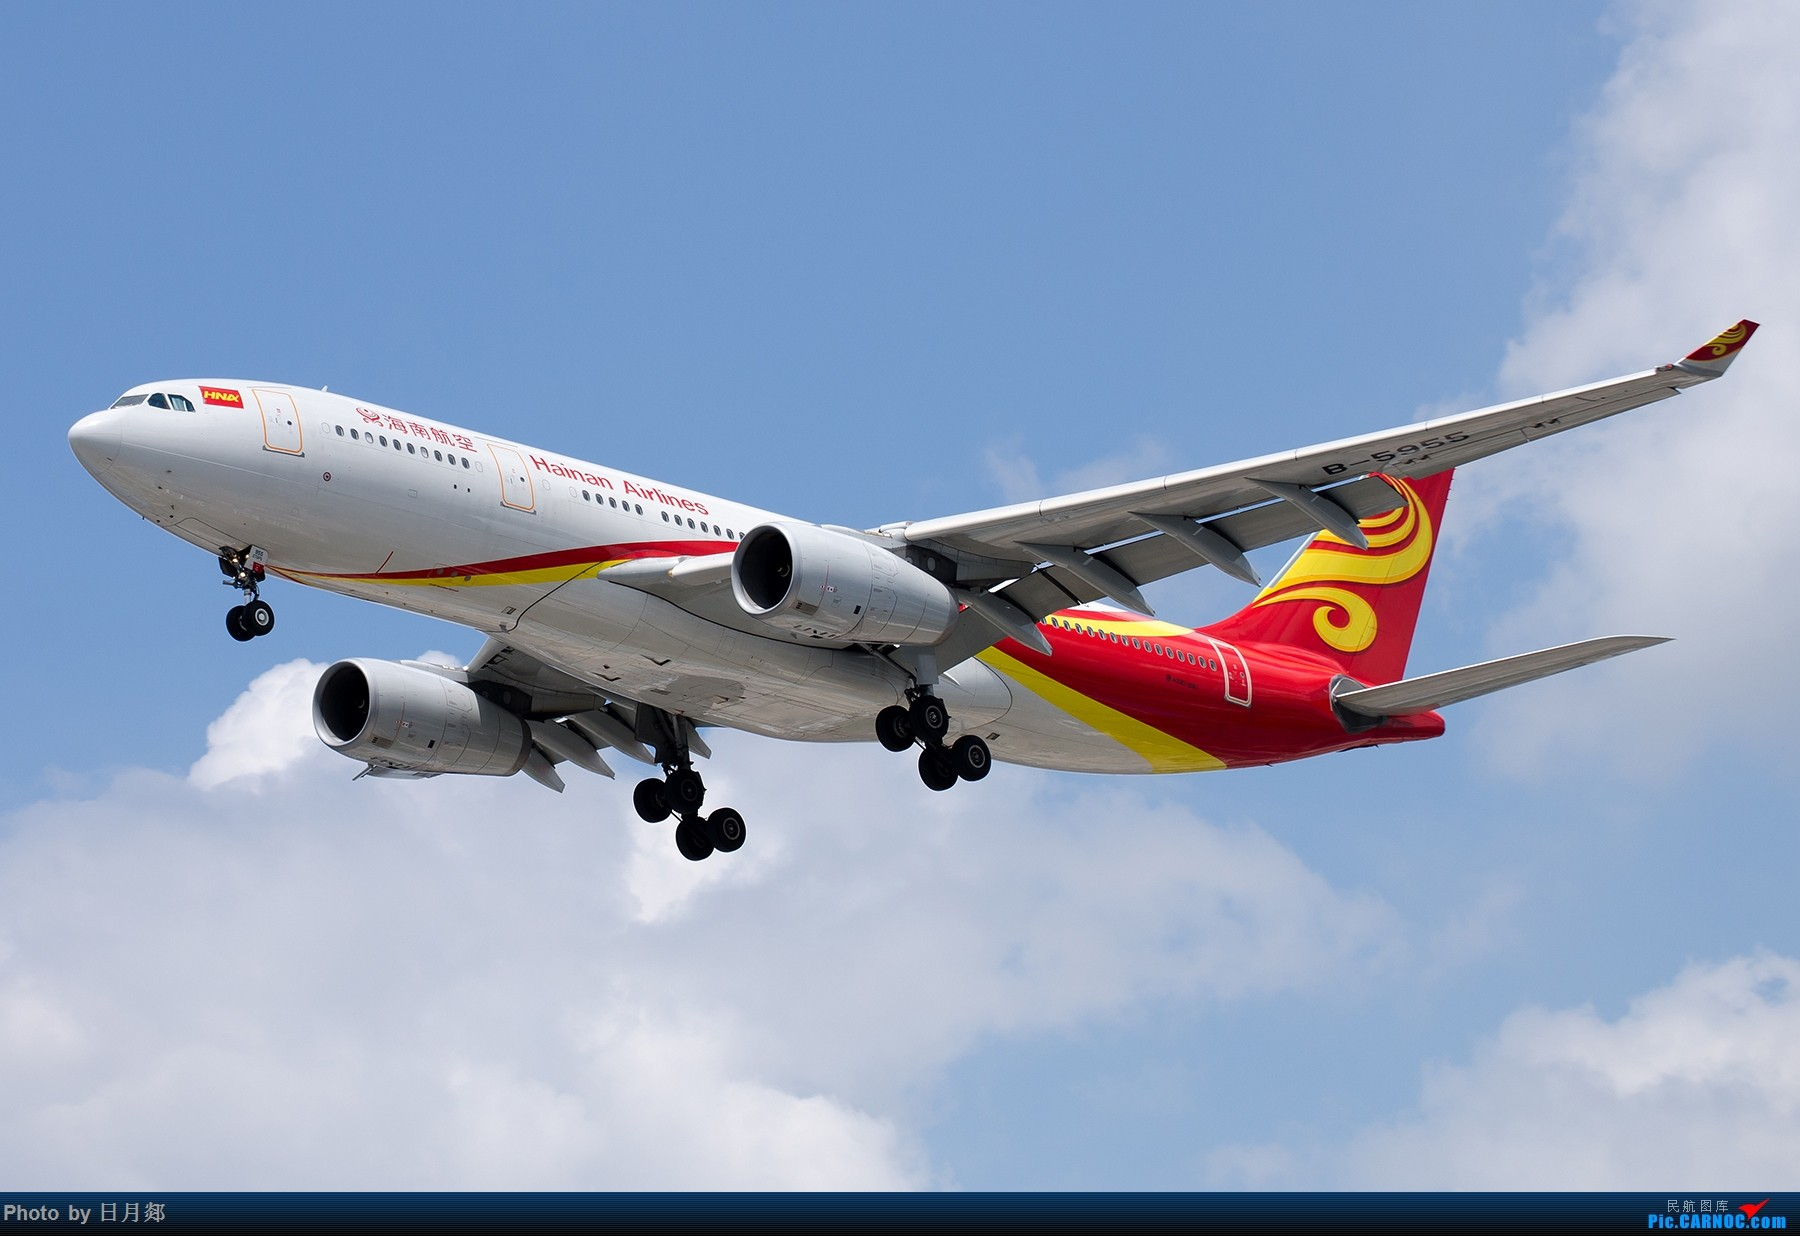 Re:[原创]【SHA拍机*1800大图】图要抓紧发,不然就要炒冷饭,大头镇贴 AIRBUS A330-200 B-5955 中国上海虹桥国际机场